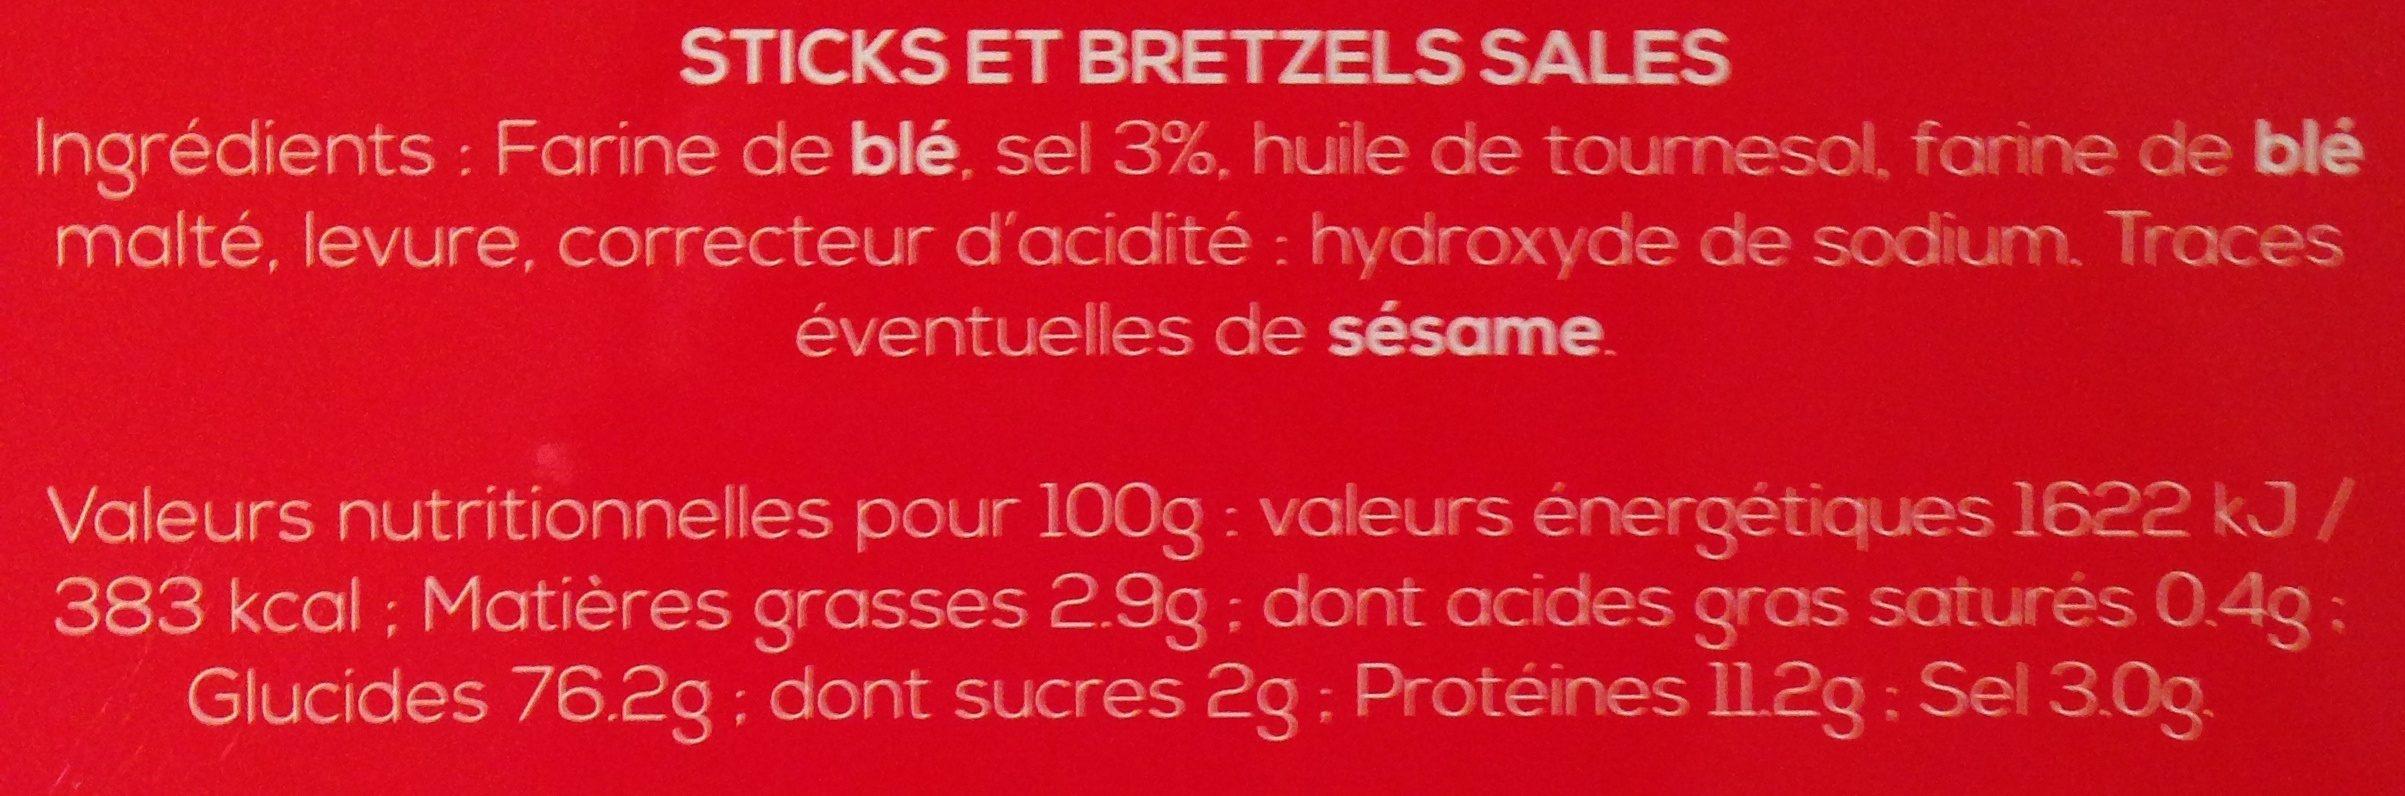 Boîte collector avec tubo sticks/bretzels - hiver - Informations nutritionnelles - fr